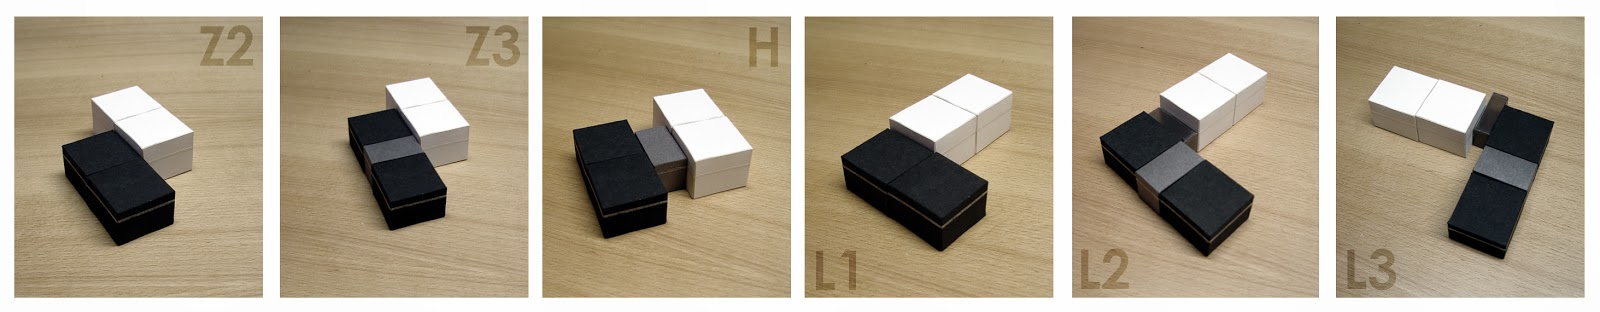 representacion-viviendas-resan-modular